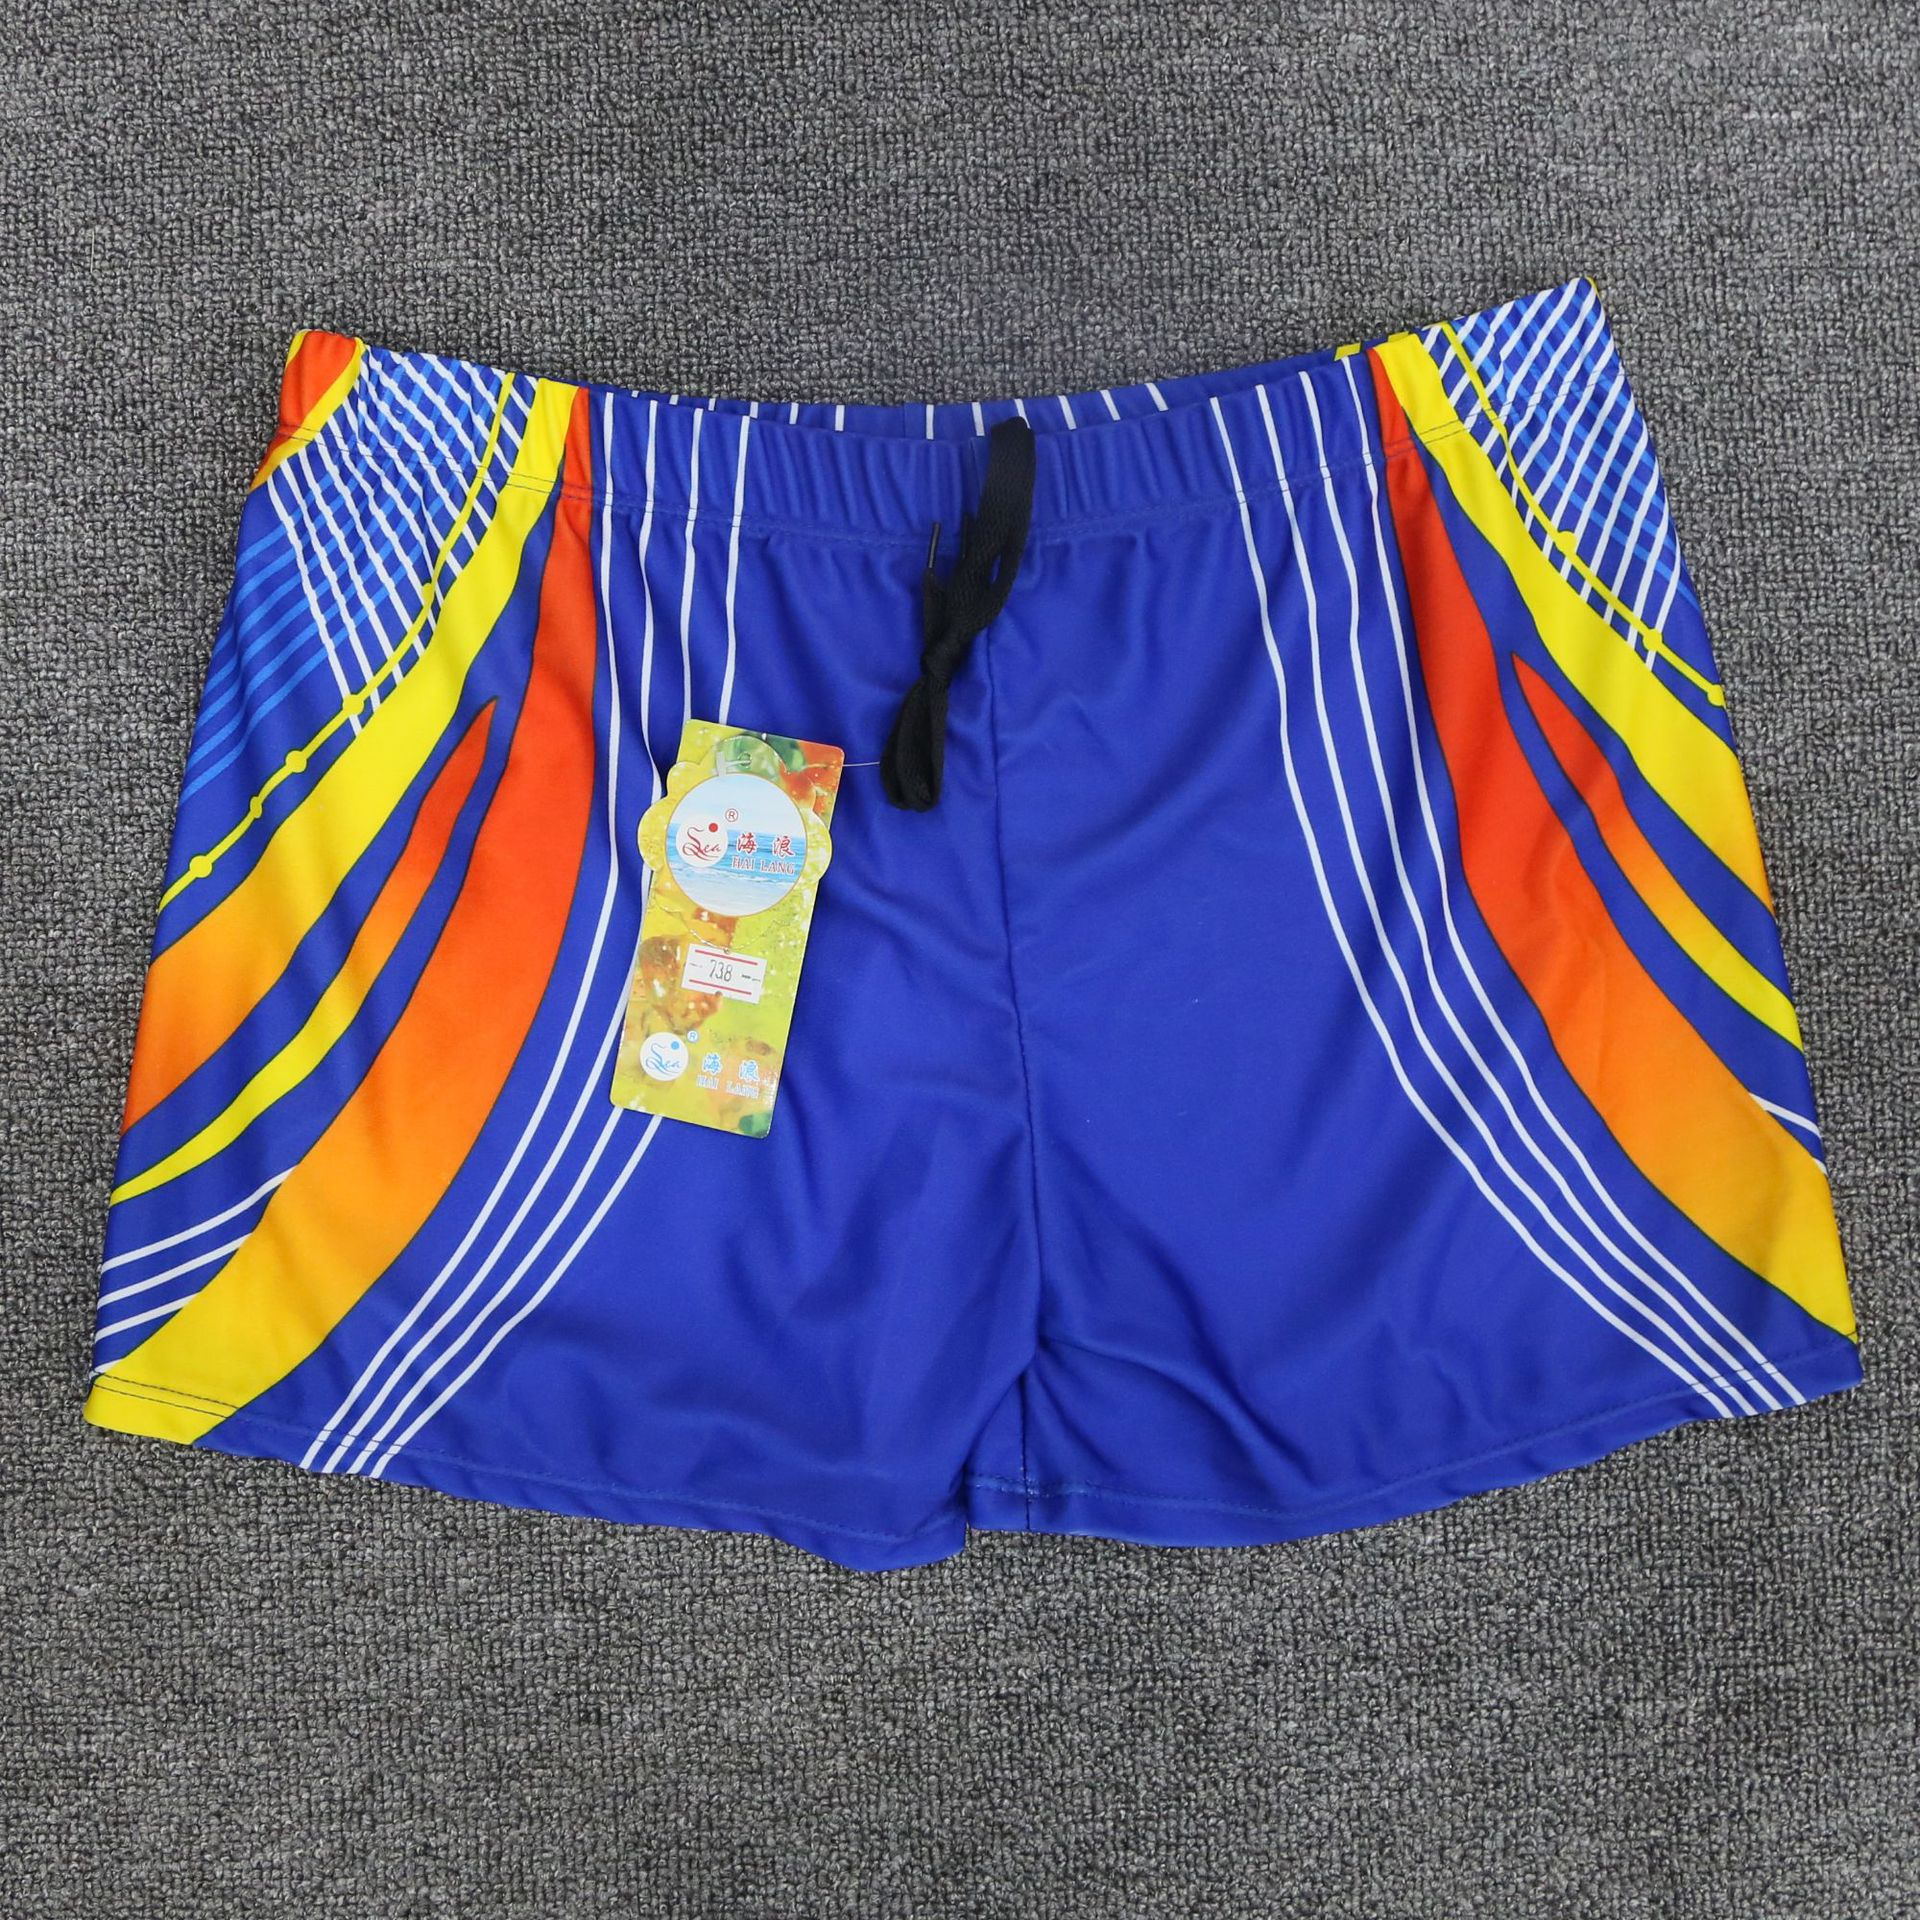 MEN'S Swimming Trunks Men AussieBum Loose-Fit Lace-up Men's Swimming Trunks